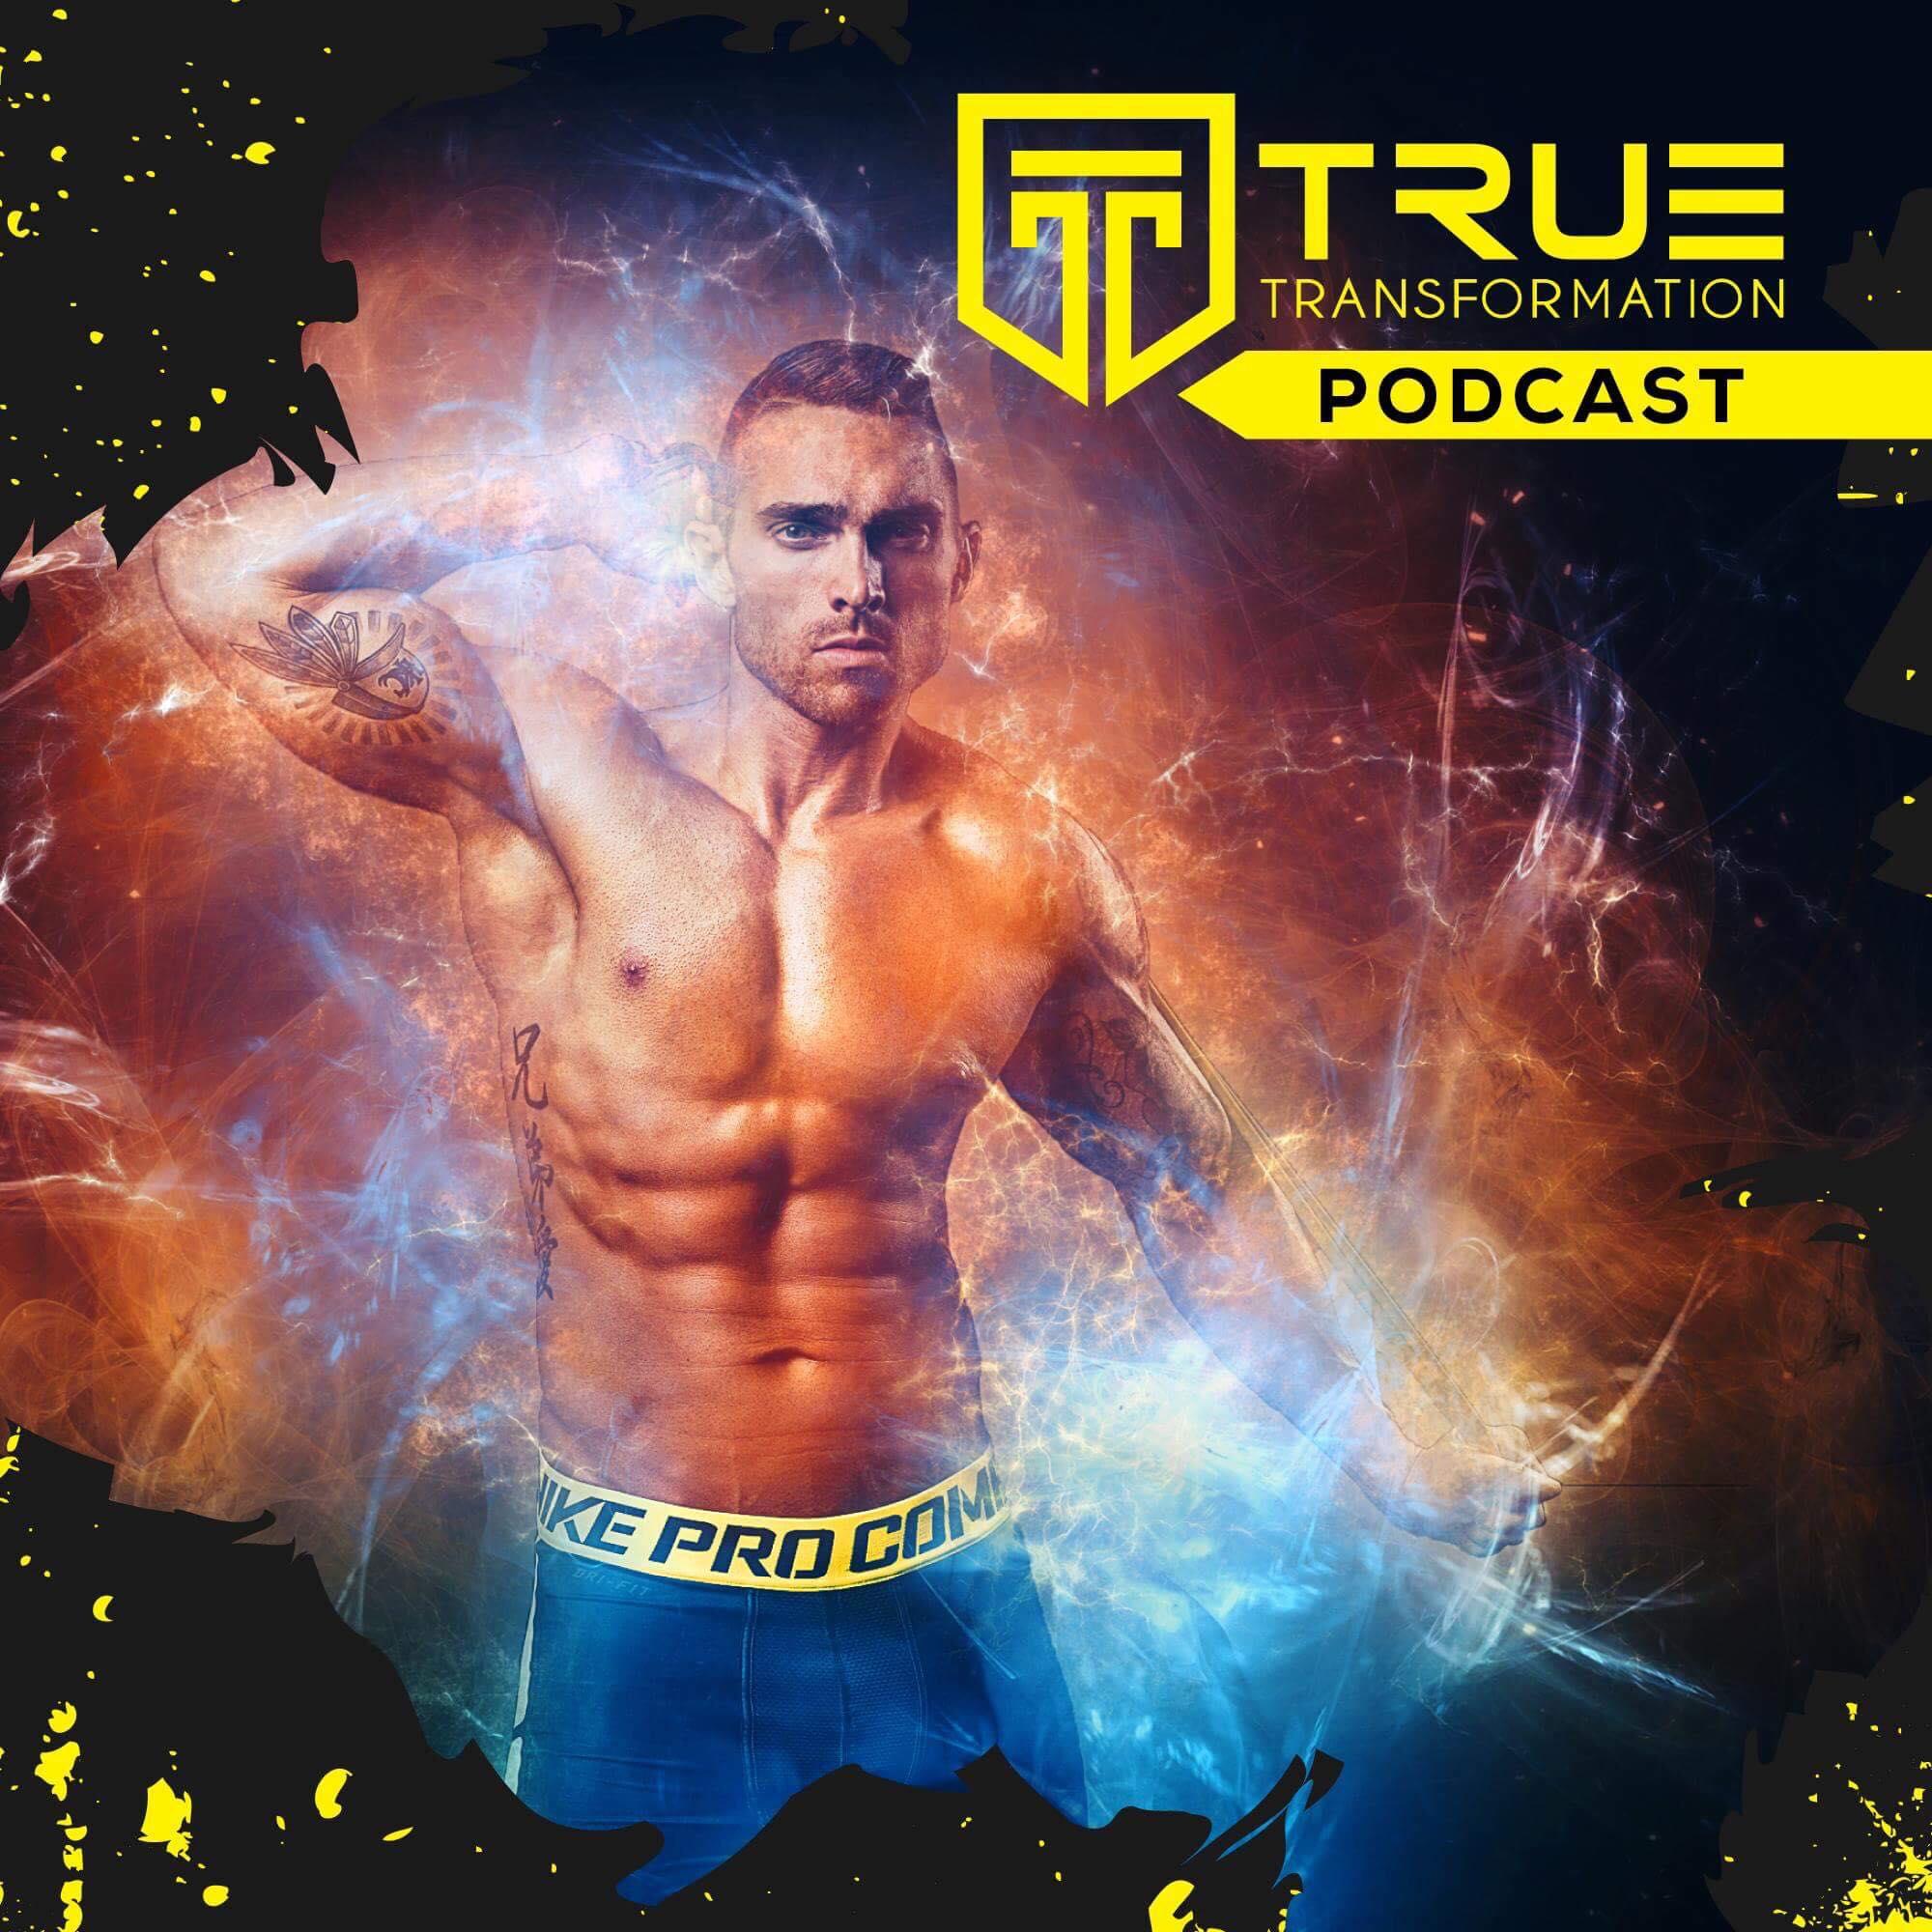 True Transformation Podcast show art